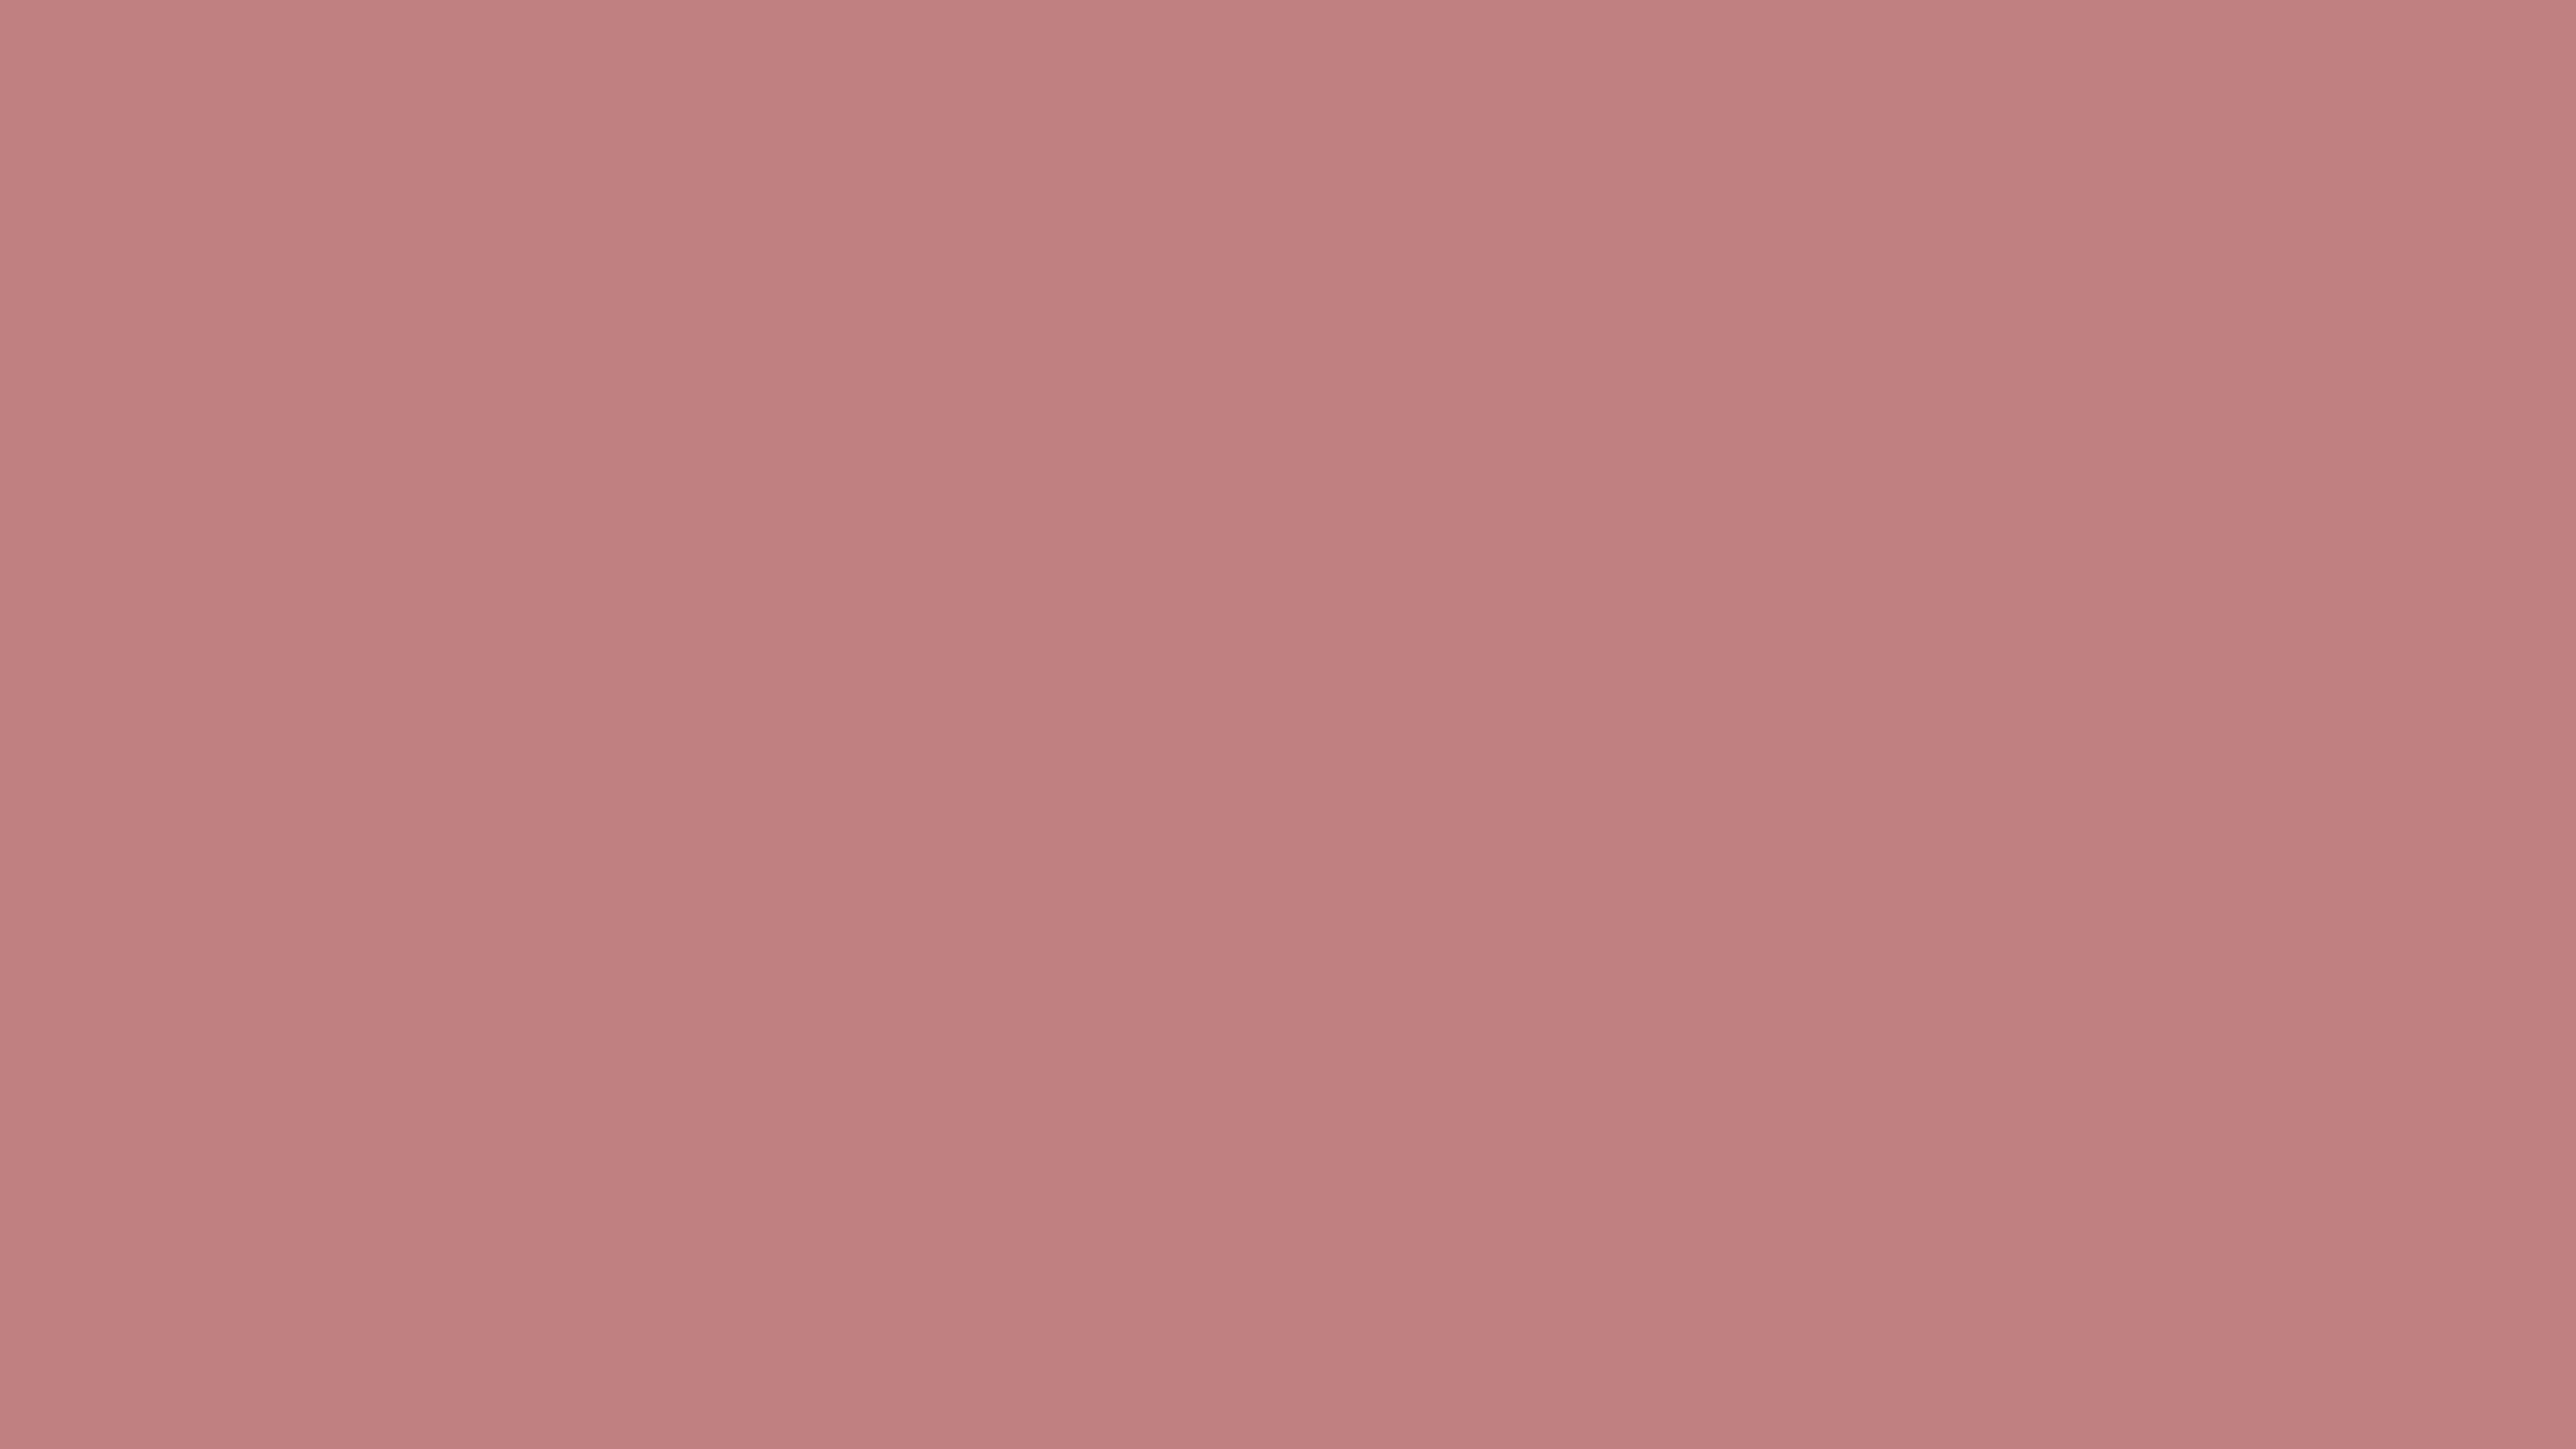 3840x2160 Old Rose Solid Color Background